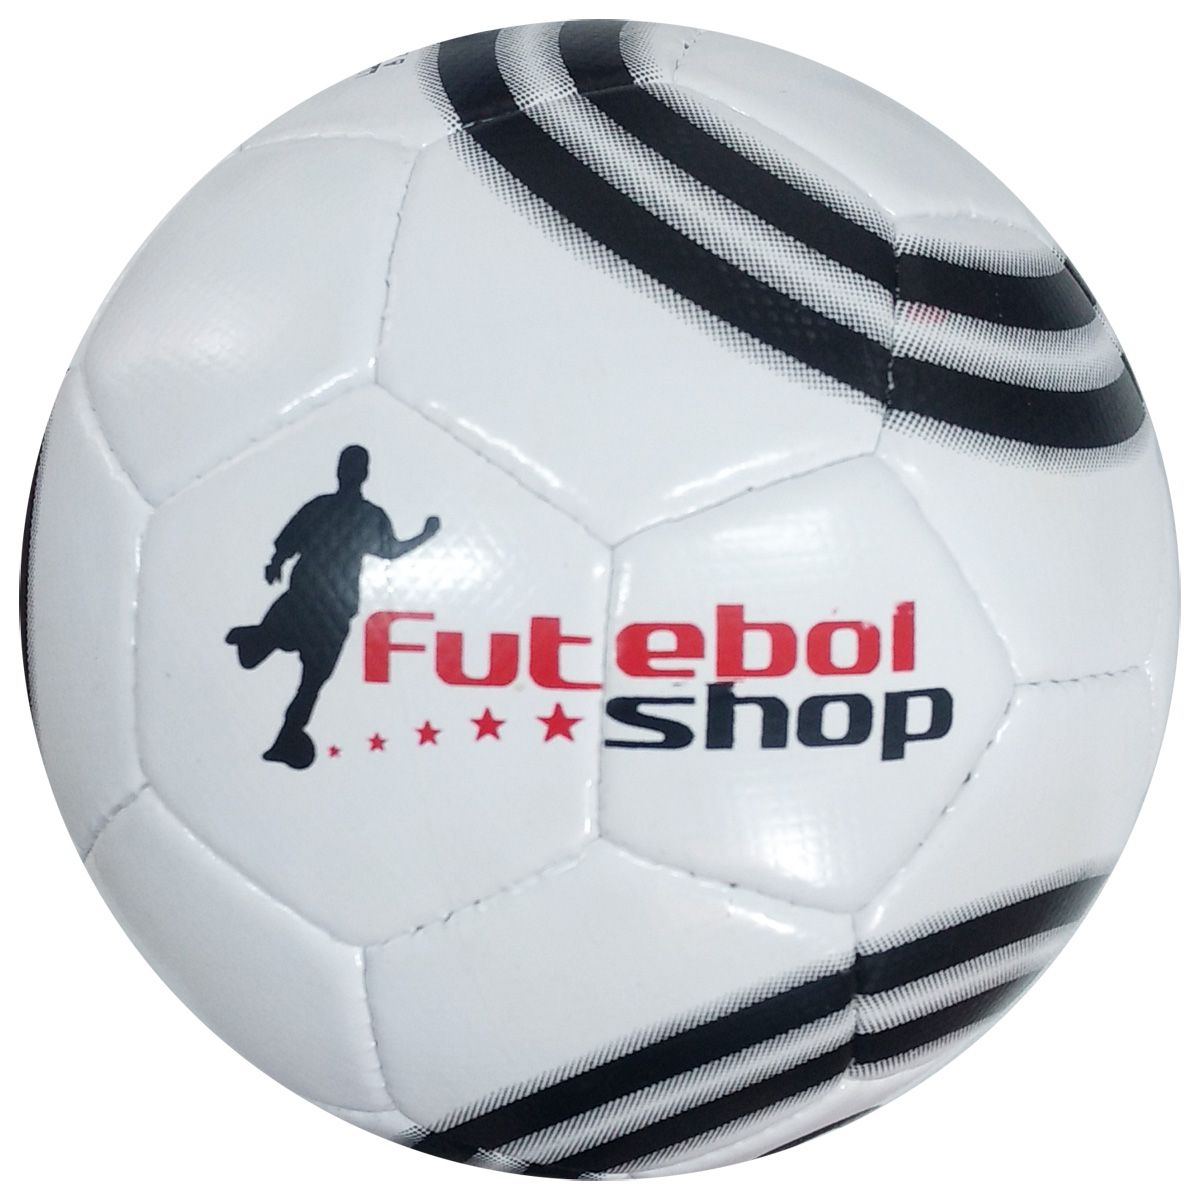 Bola Futebol Shop Infantil Número 3 Micropower